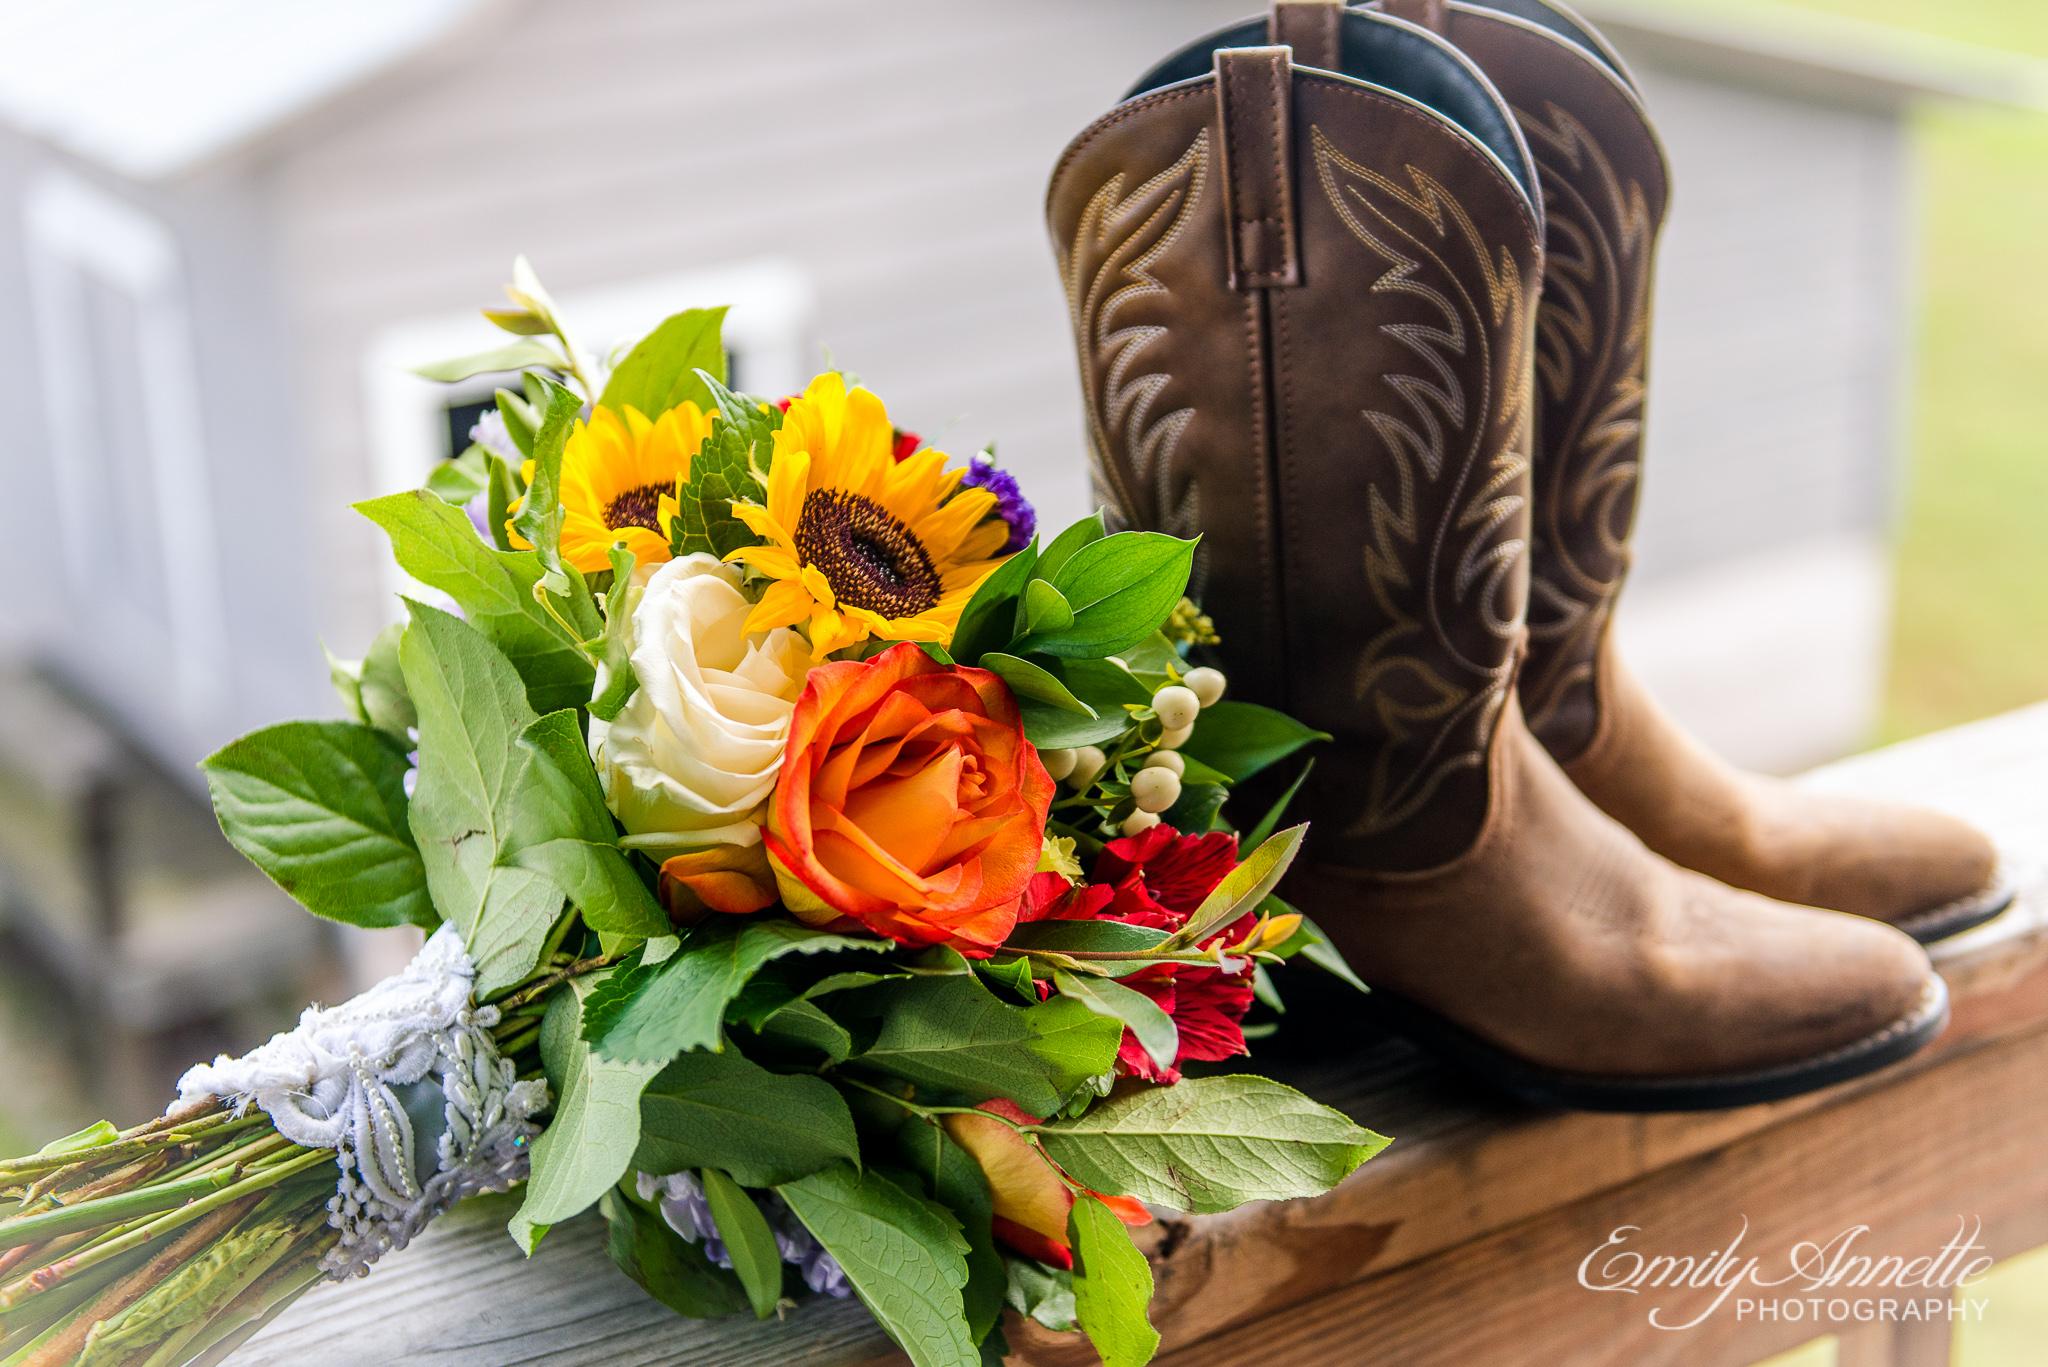 A fall bridal bouquet lies next to a pair of cowboy boots before a wedding at Amber Grove near Richmond, Virginia